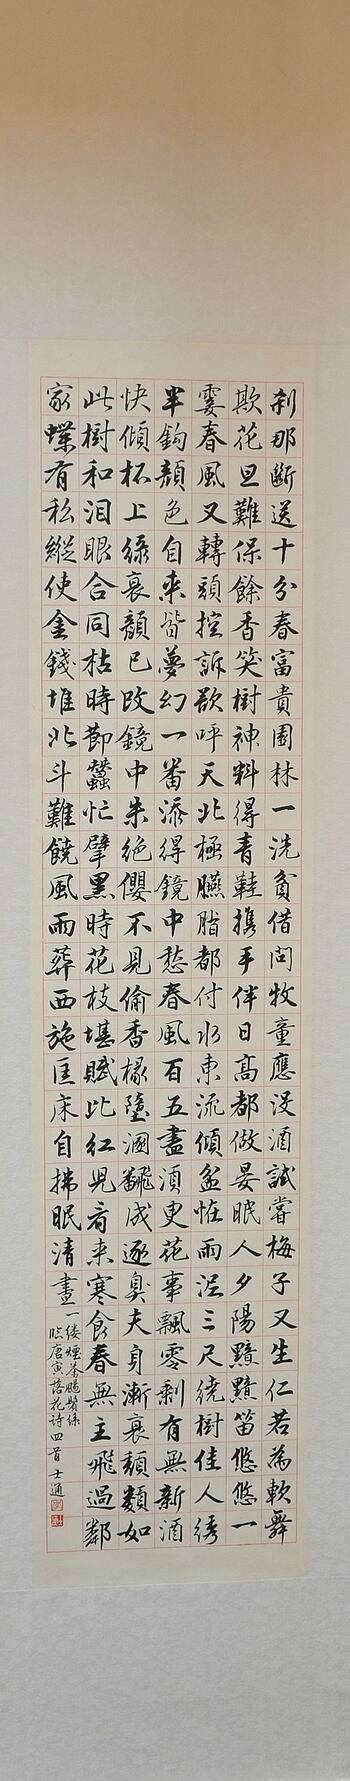 Zhulu Adult Calligraphy Class - 竹盧成人书法班